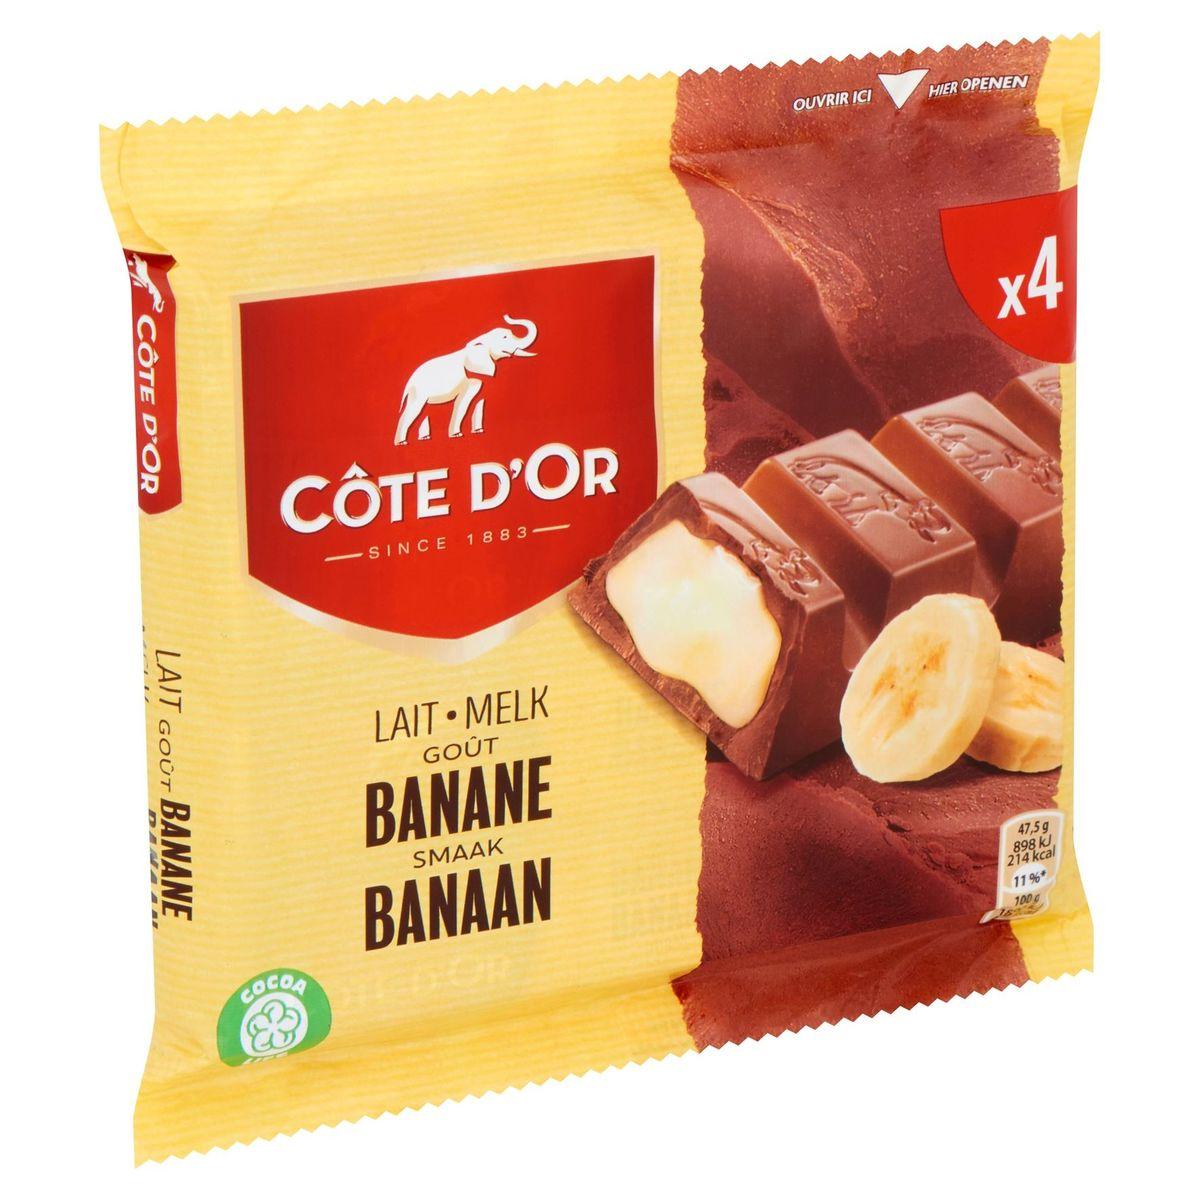 Côte d'Or Lait Goût Banane 4 x 47.5 g